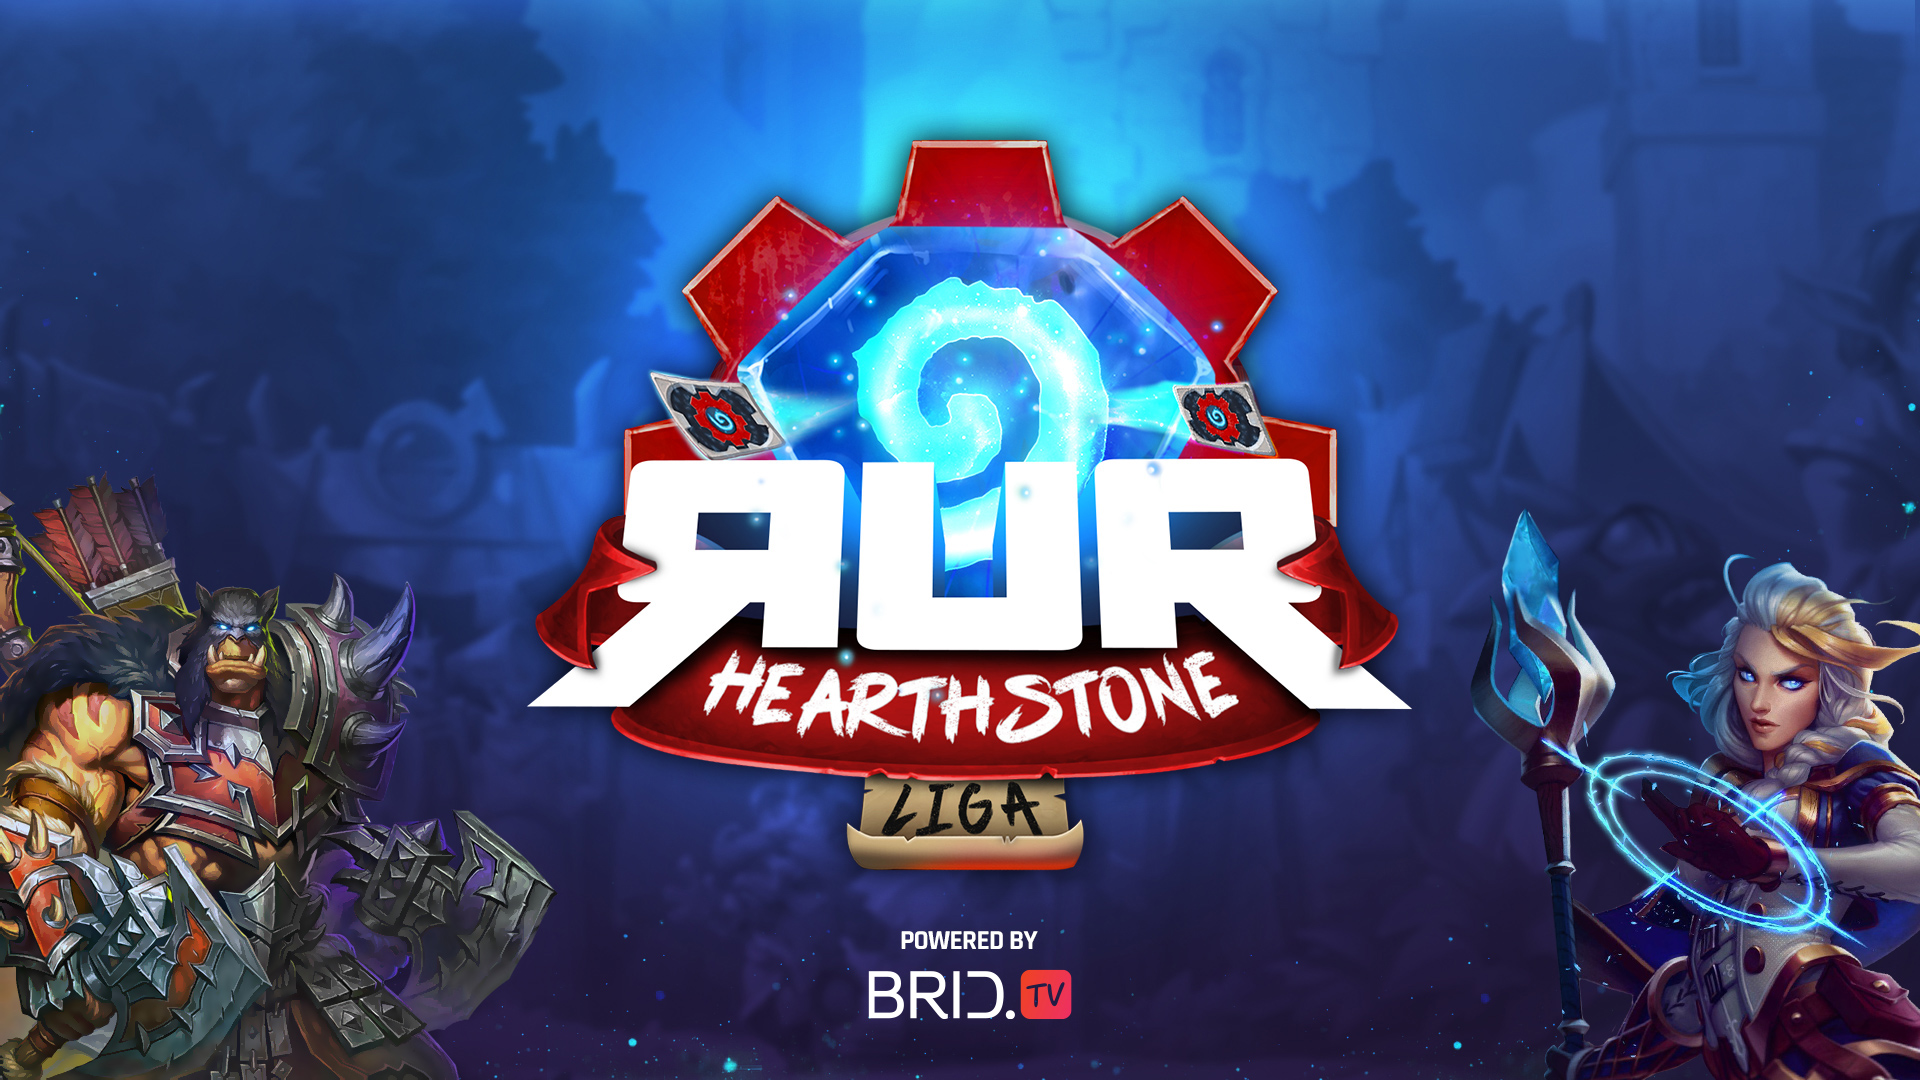 Hearthstone1920